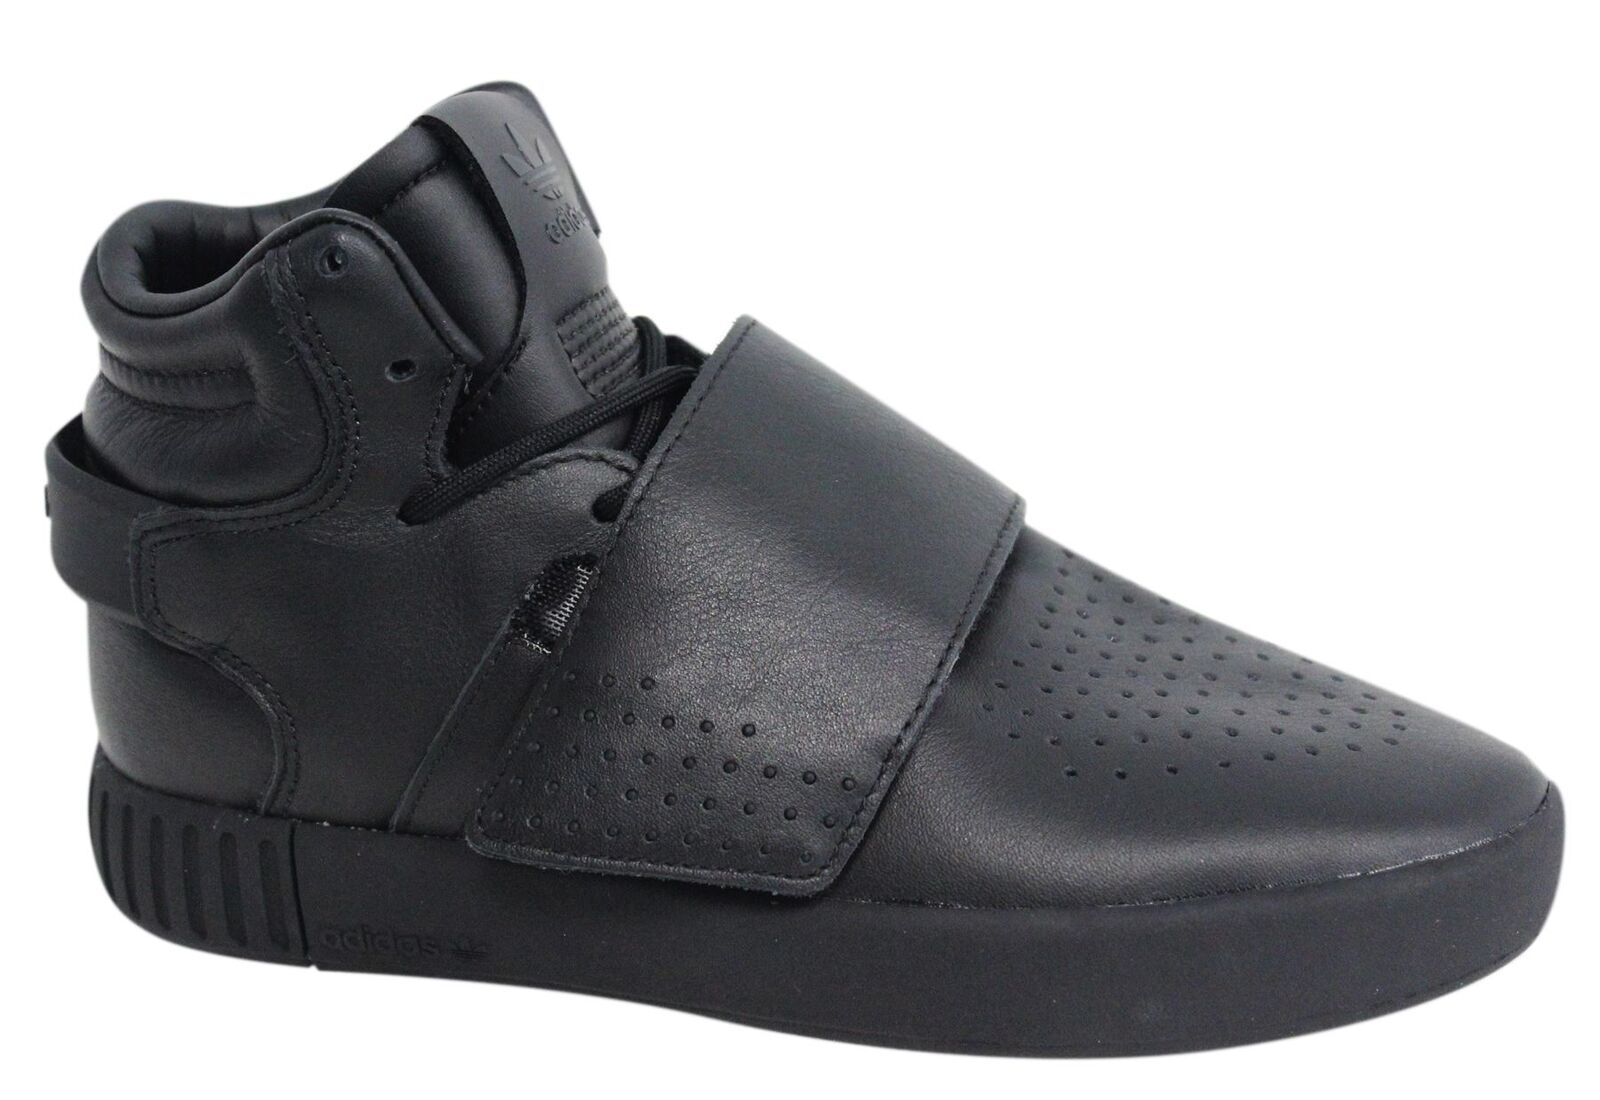 Adidas Tubular Invader Strap Lace Up Mens Hi Black Leather Trainers BW0871 M11